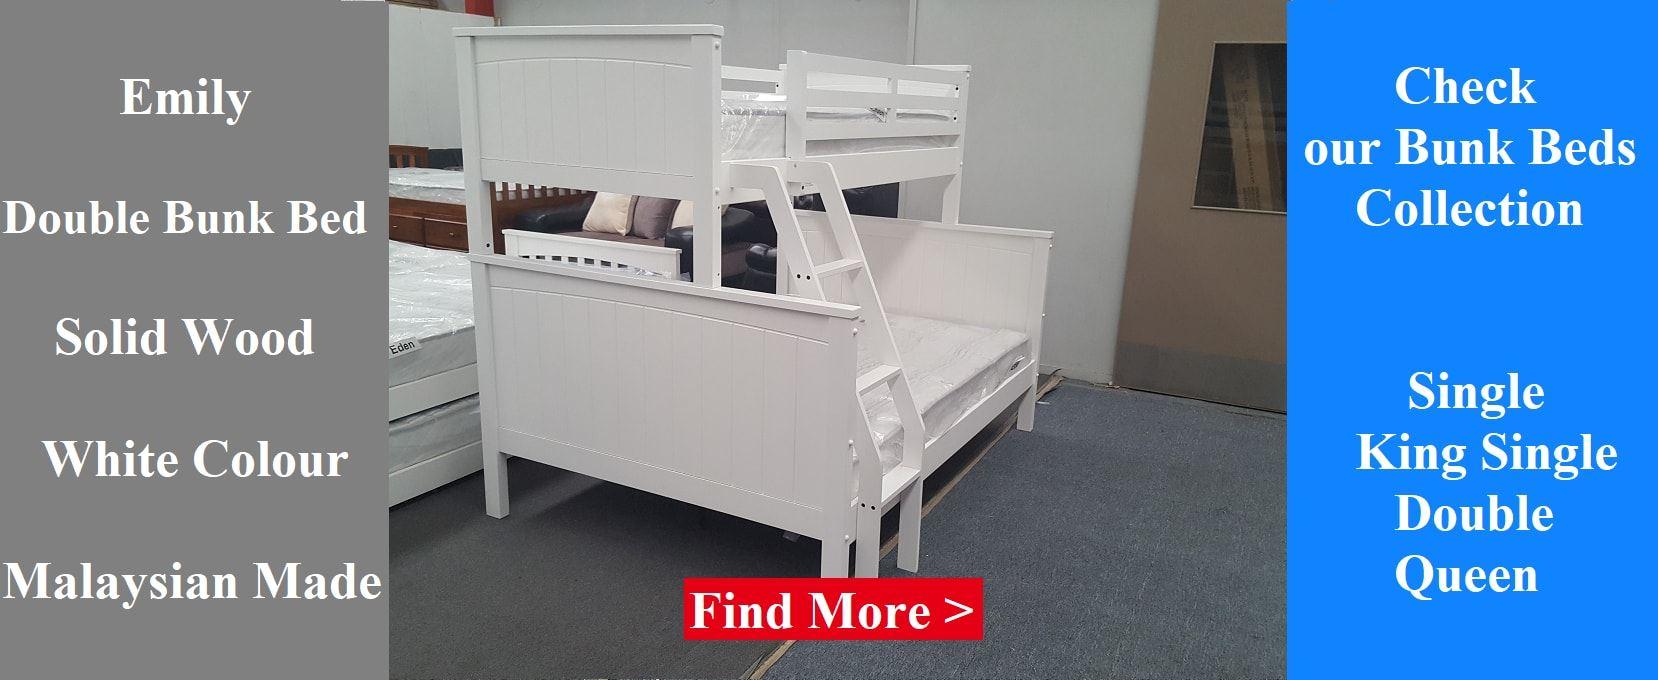 Furniture Place: Buy Beds, Mattress, Kids Bed Online Auckland, NZ